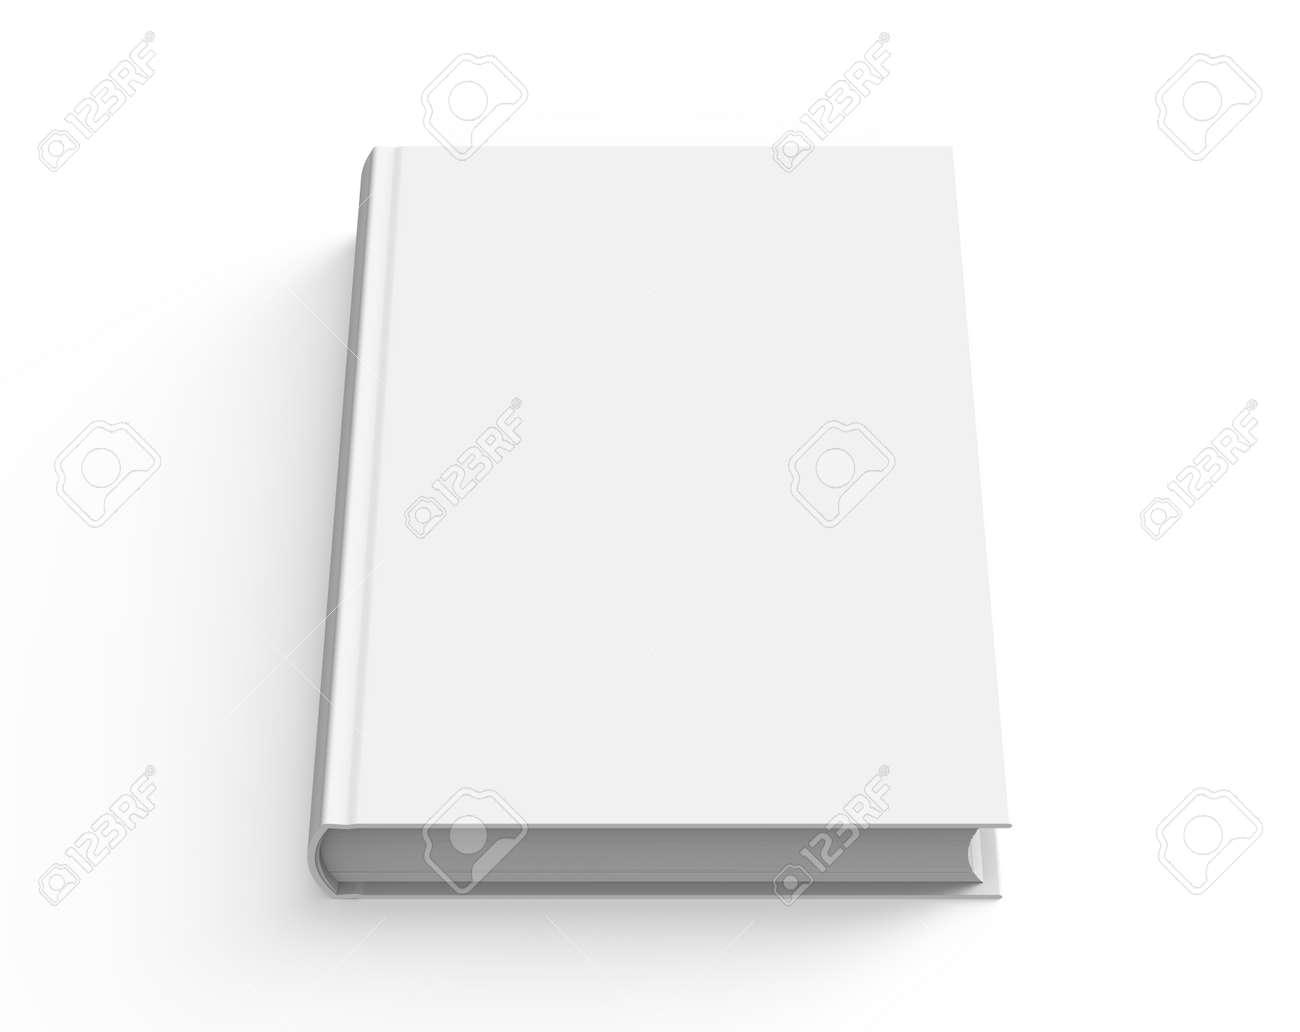 Blank hard cover book template blank book cover for design isolated blank hard cover book template blank book cover for design isolated on white background maxwellsz